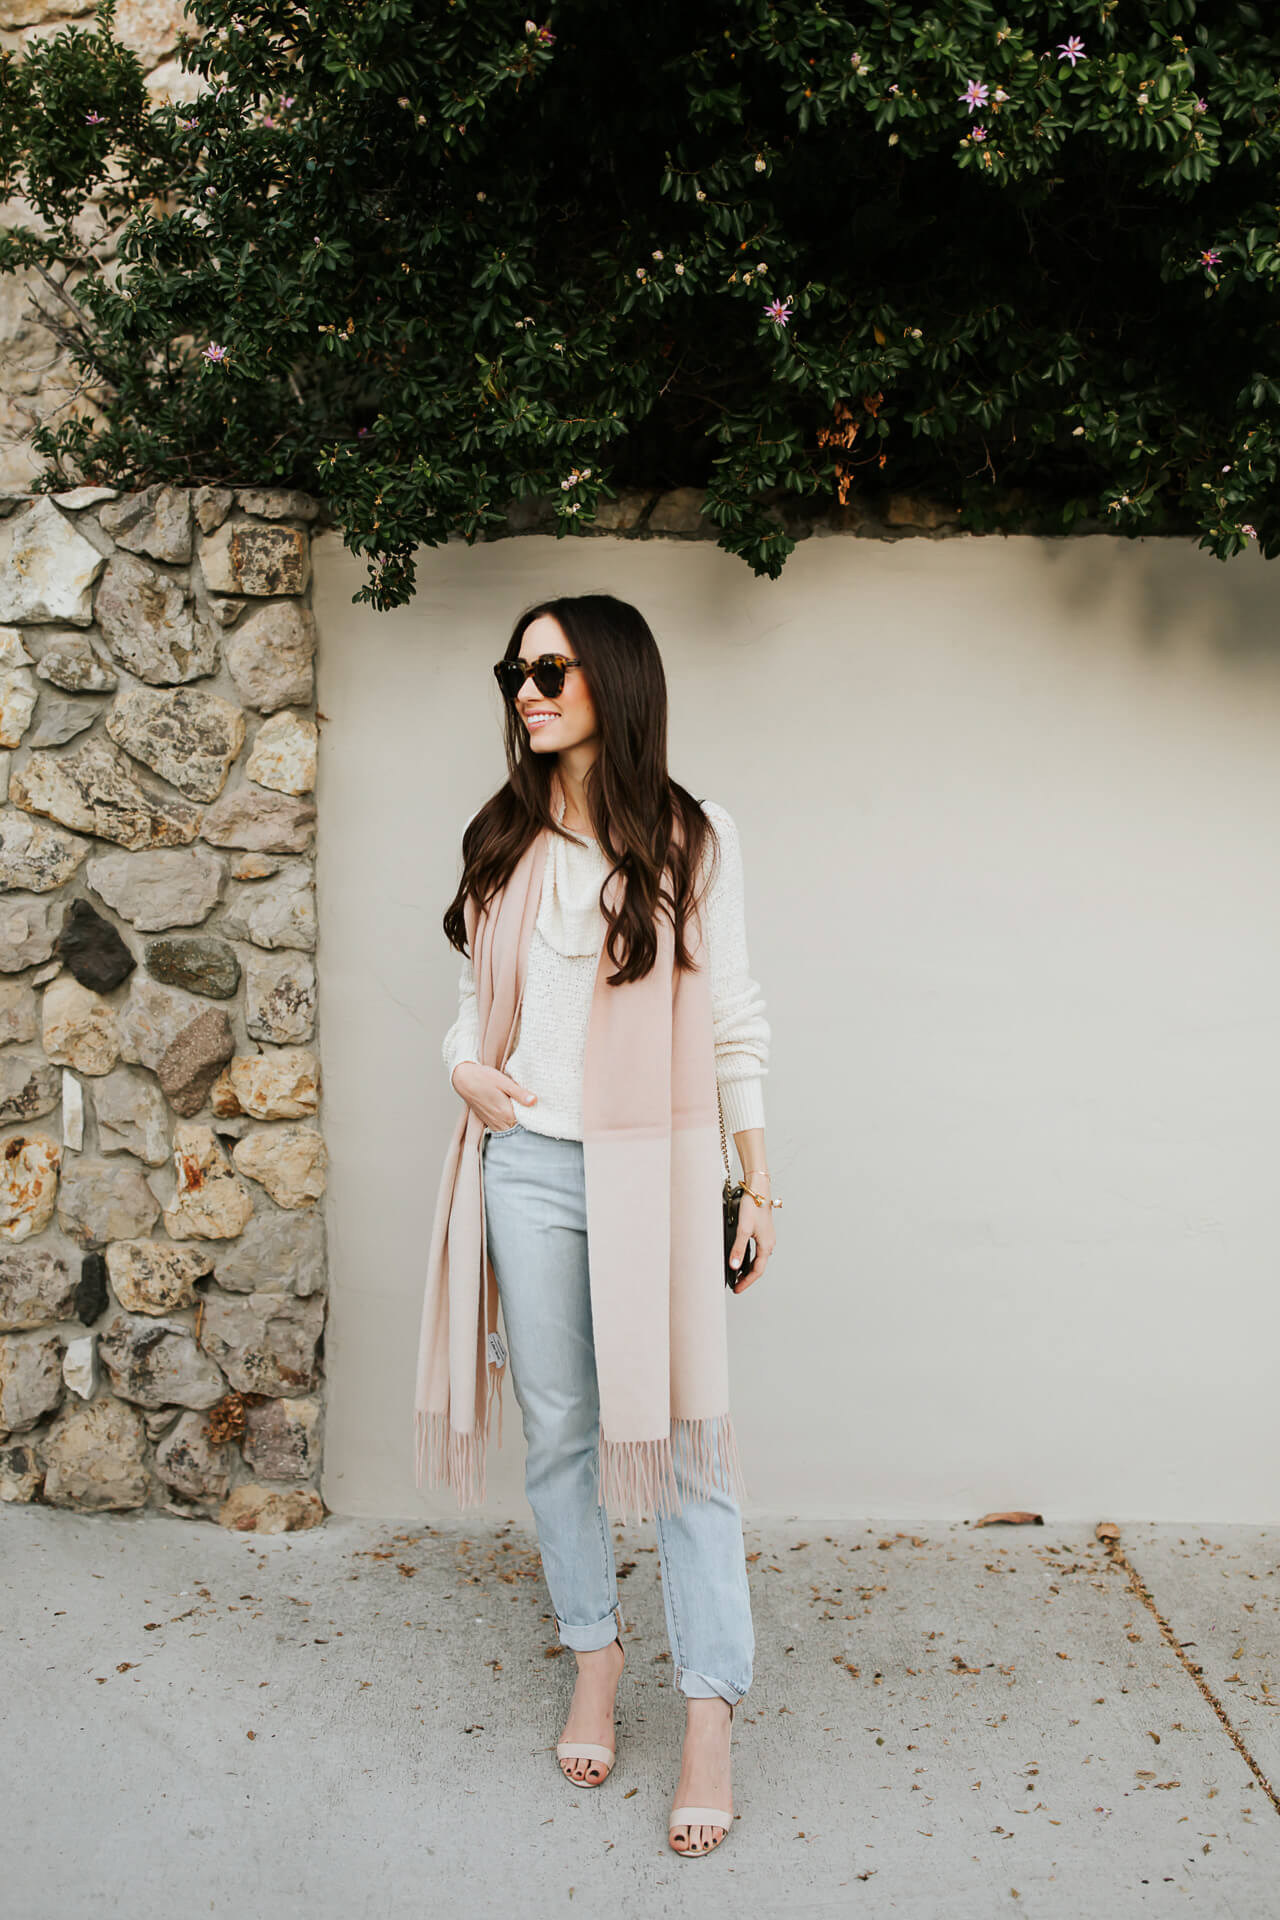 LA Fashion Blogger styles neutral for winter -  M Loves M @marmar